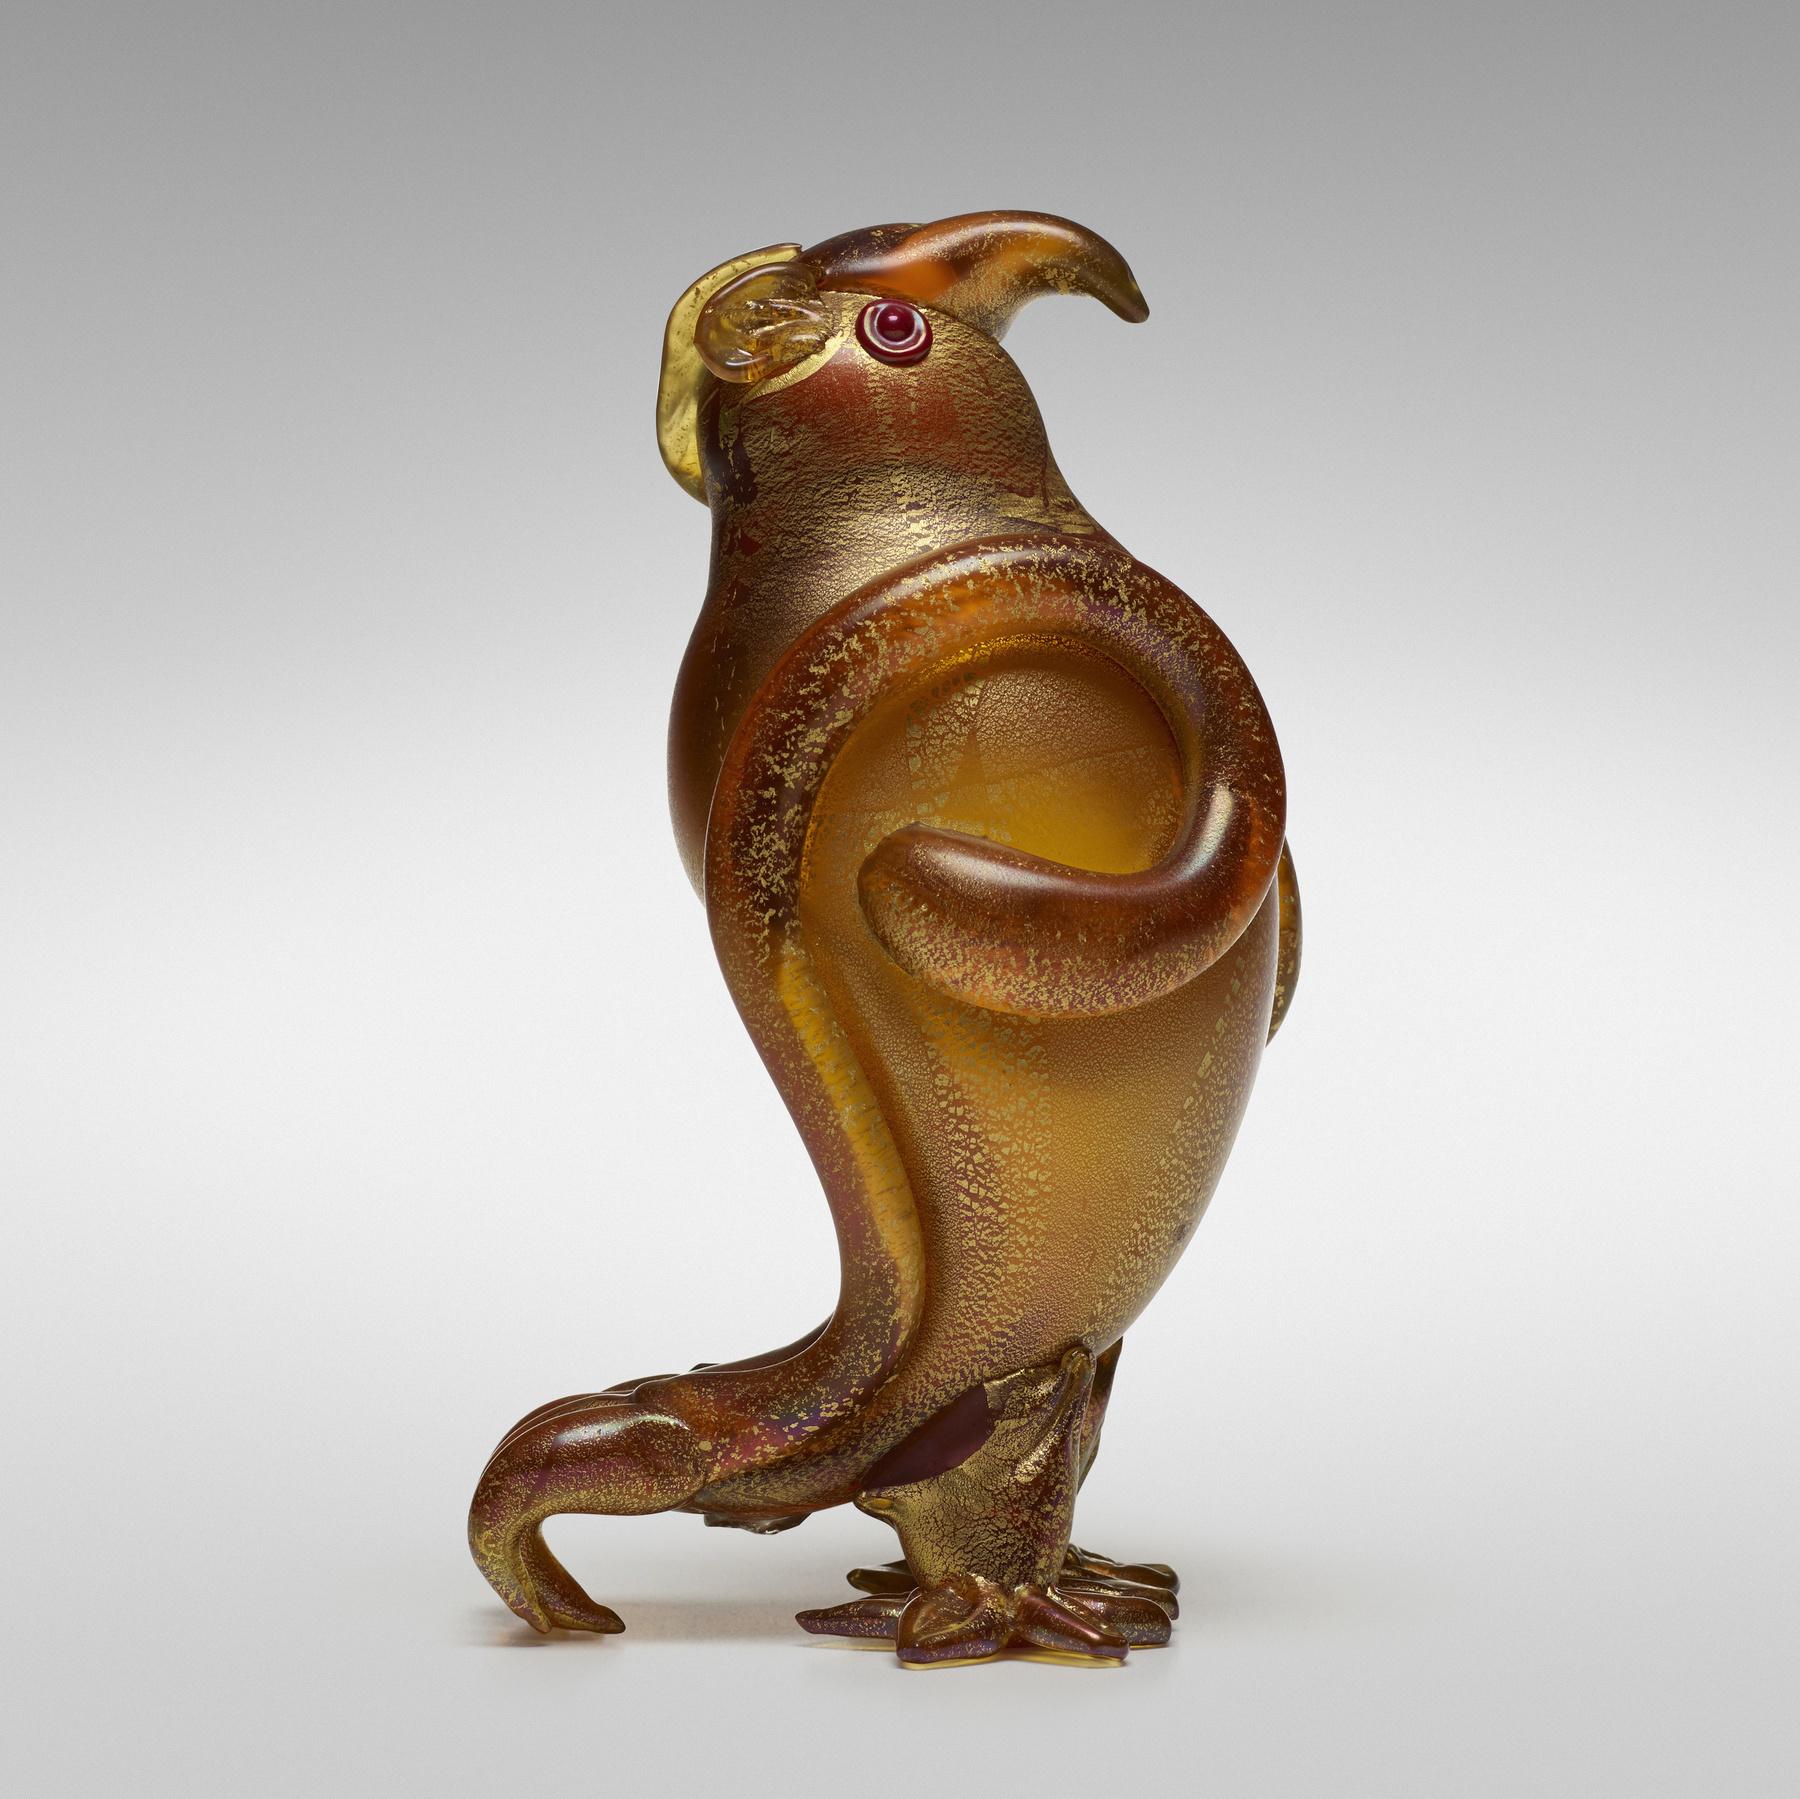 171 1 Important Italian Glass April 2020 Carlo Scarpa Owl Model 4757 Wright Auction